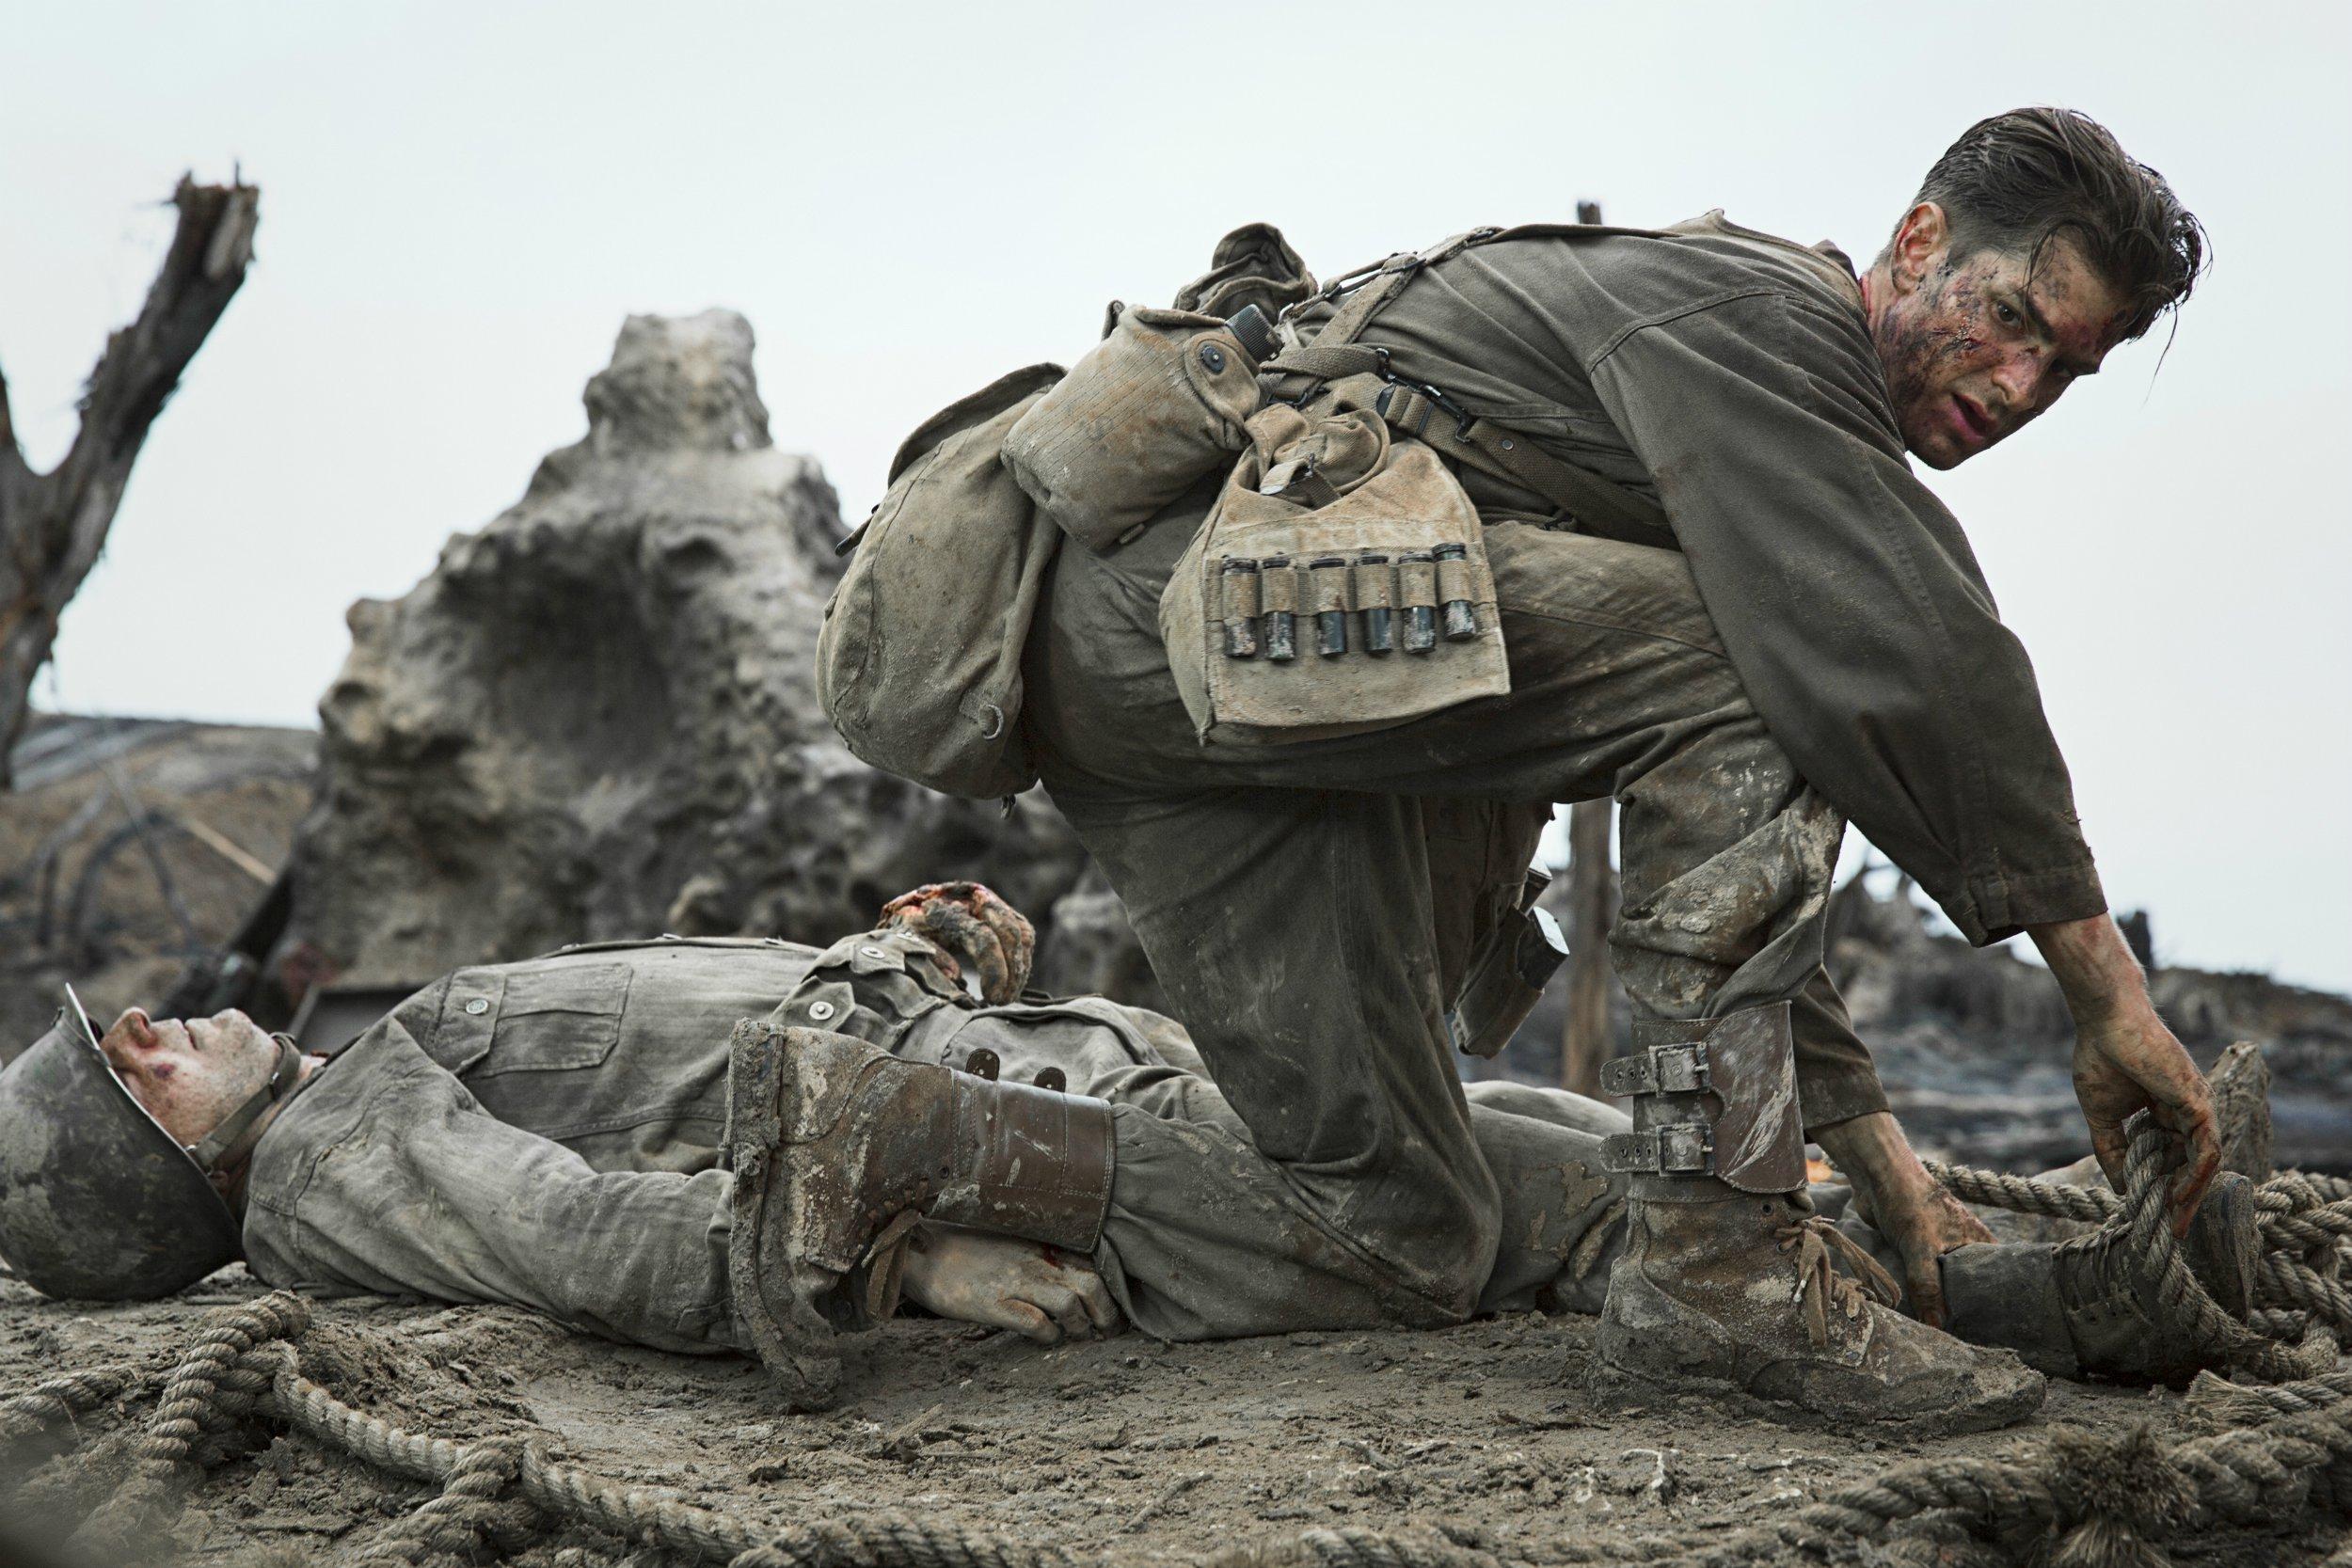 war movies worth army medic watching ridge hacksaw field game american